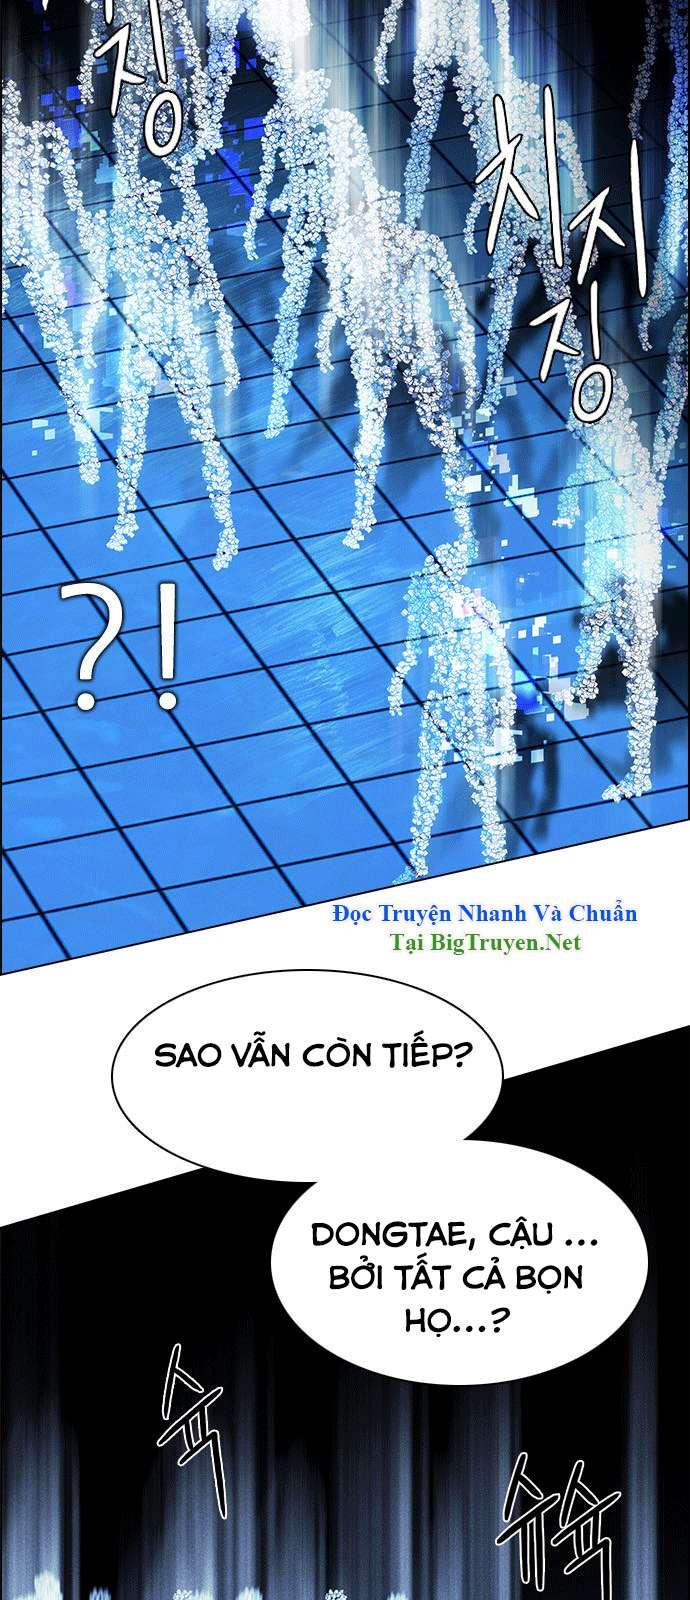 DICE Chapter 159 - Lhmanga.net